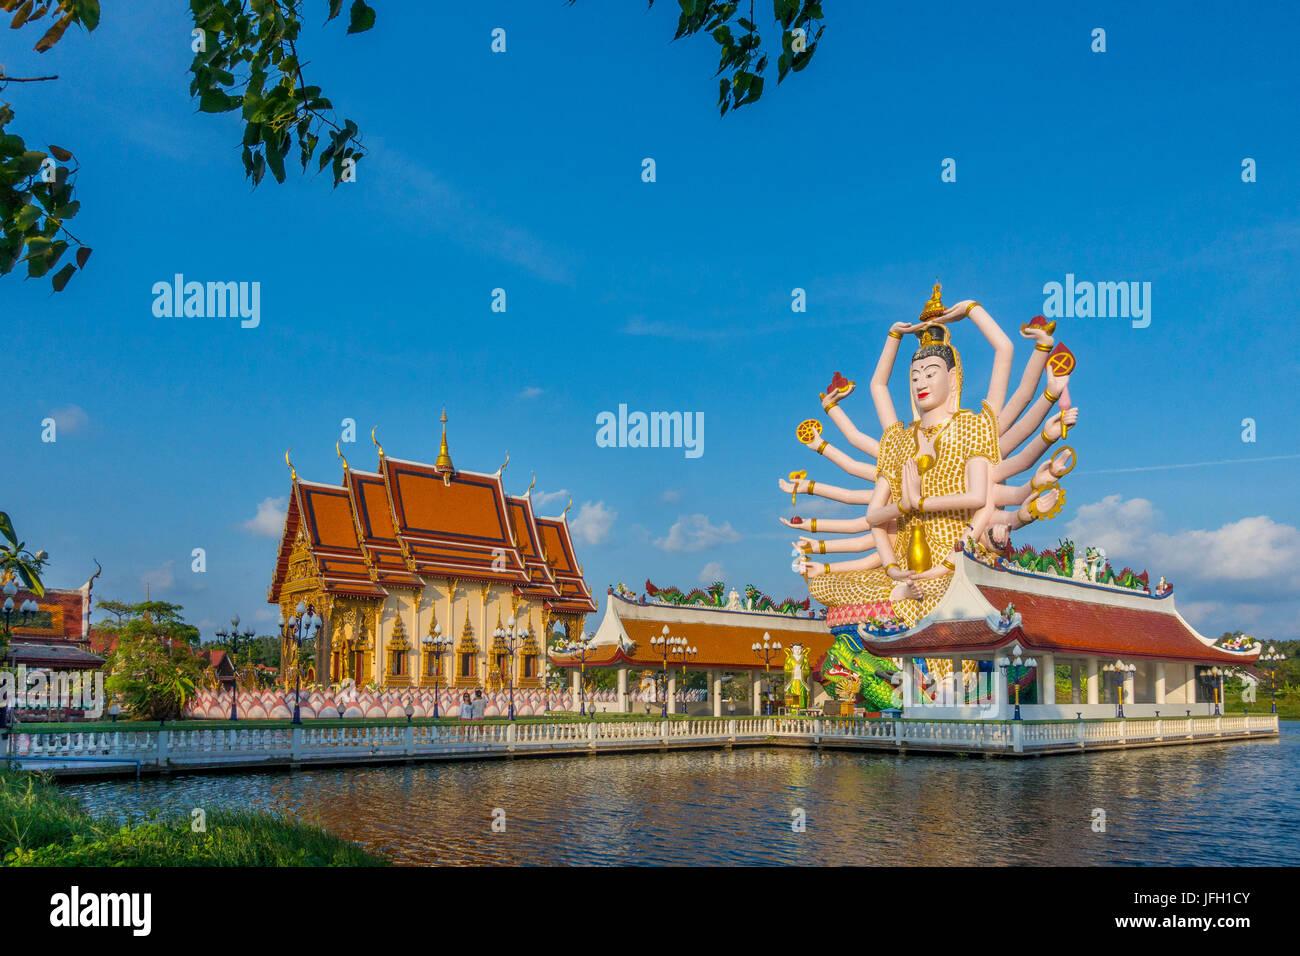 Ajo Suwannaram Dieu temple à Ban Bo Phut, l'île de Ko Samui, Thaïlande, Asie Photo Stock